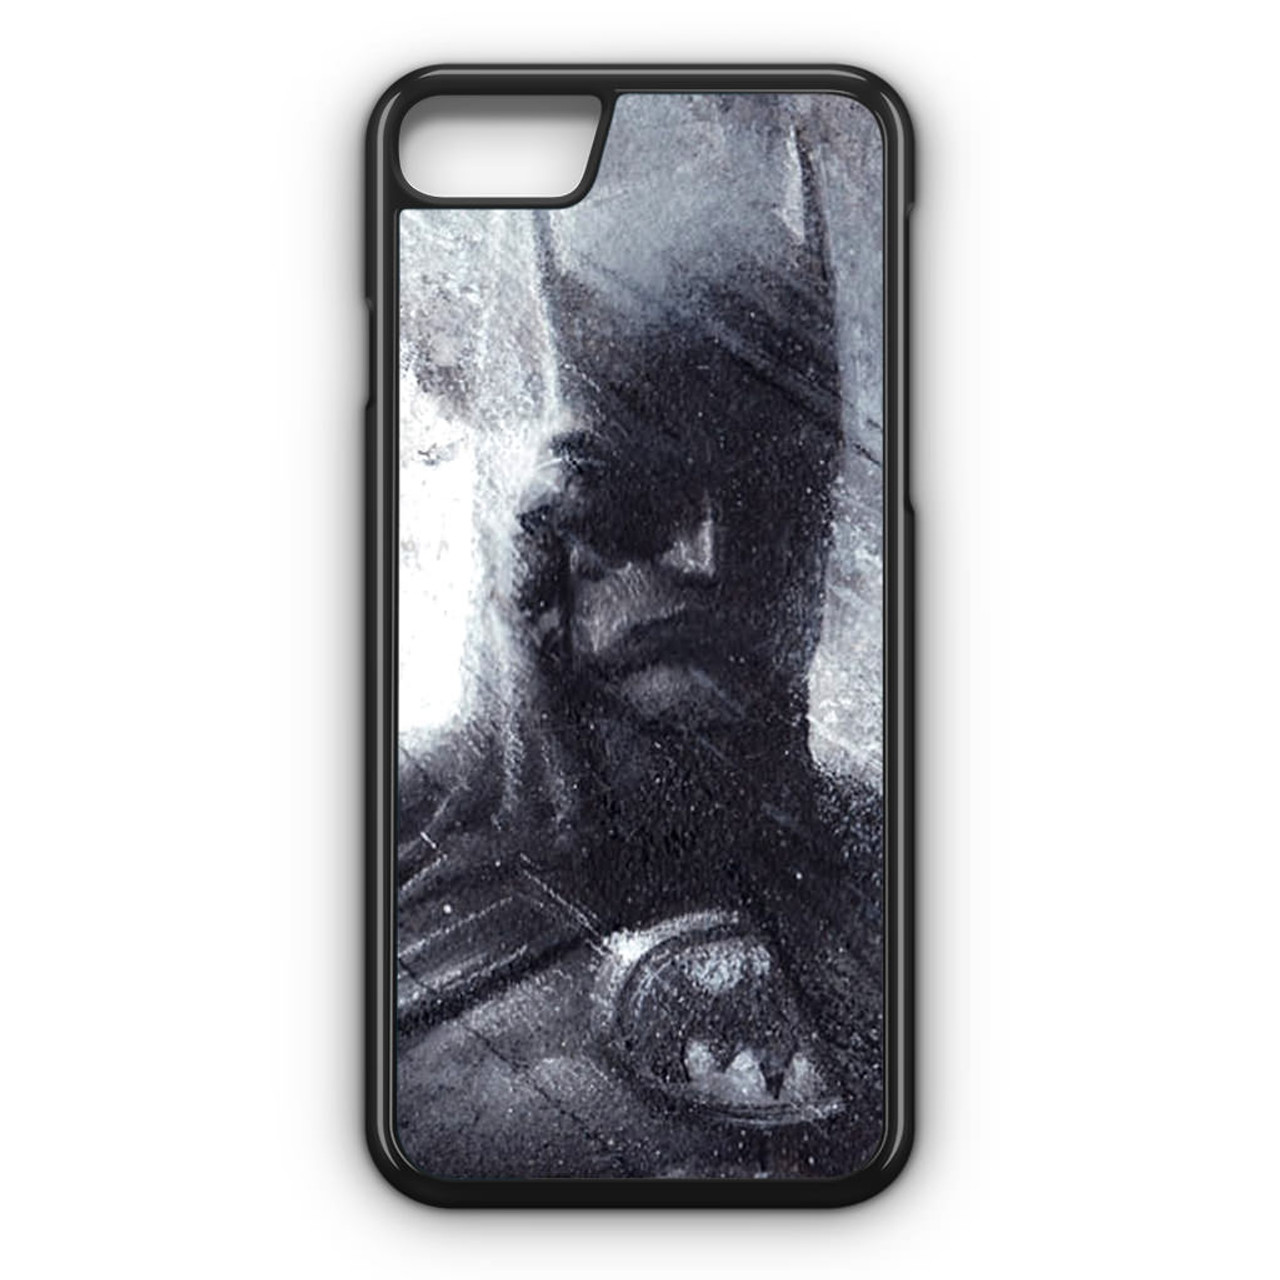 iphone 7 case comic